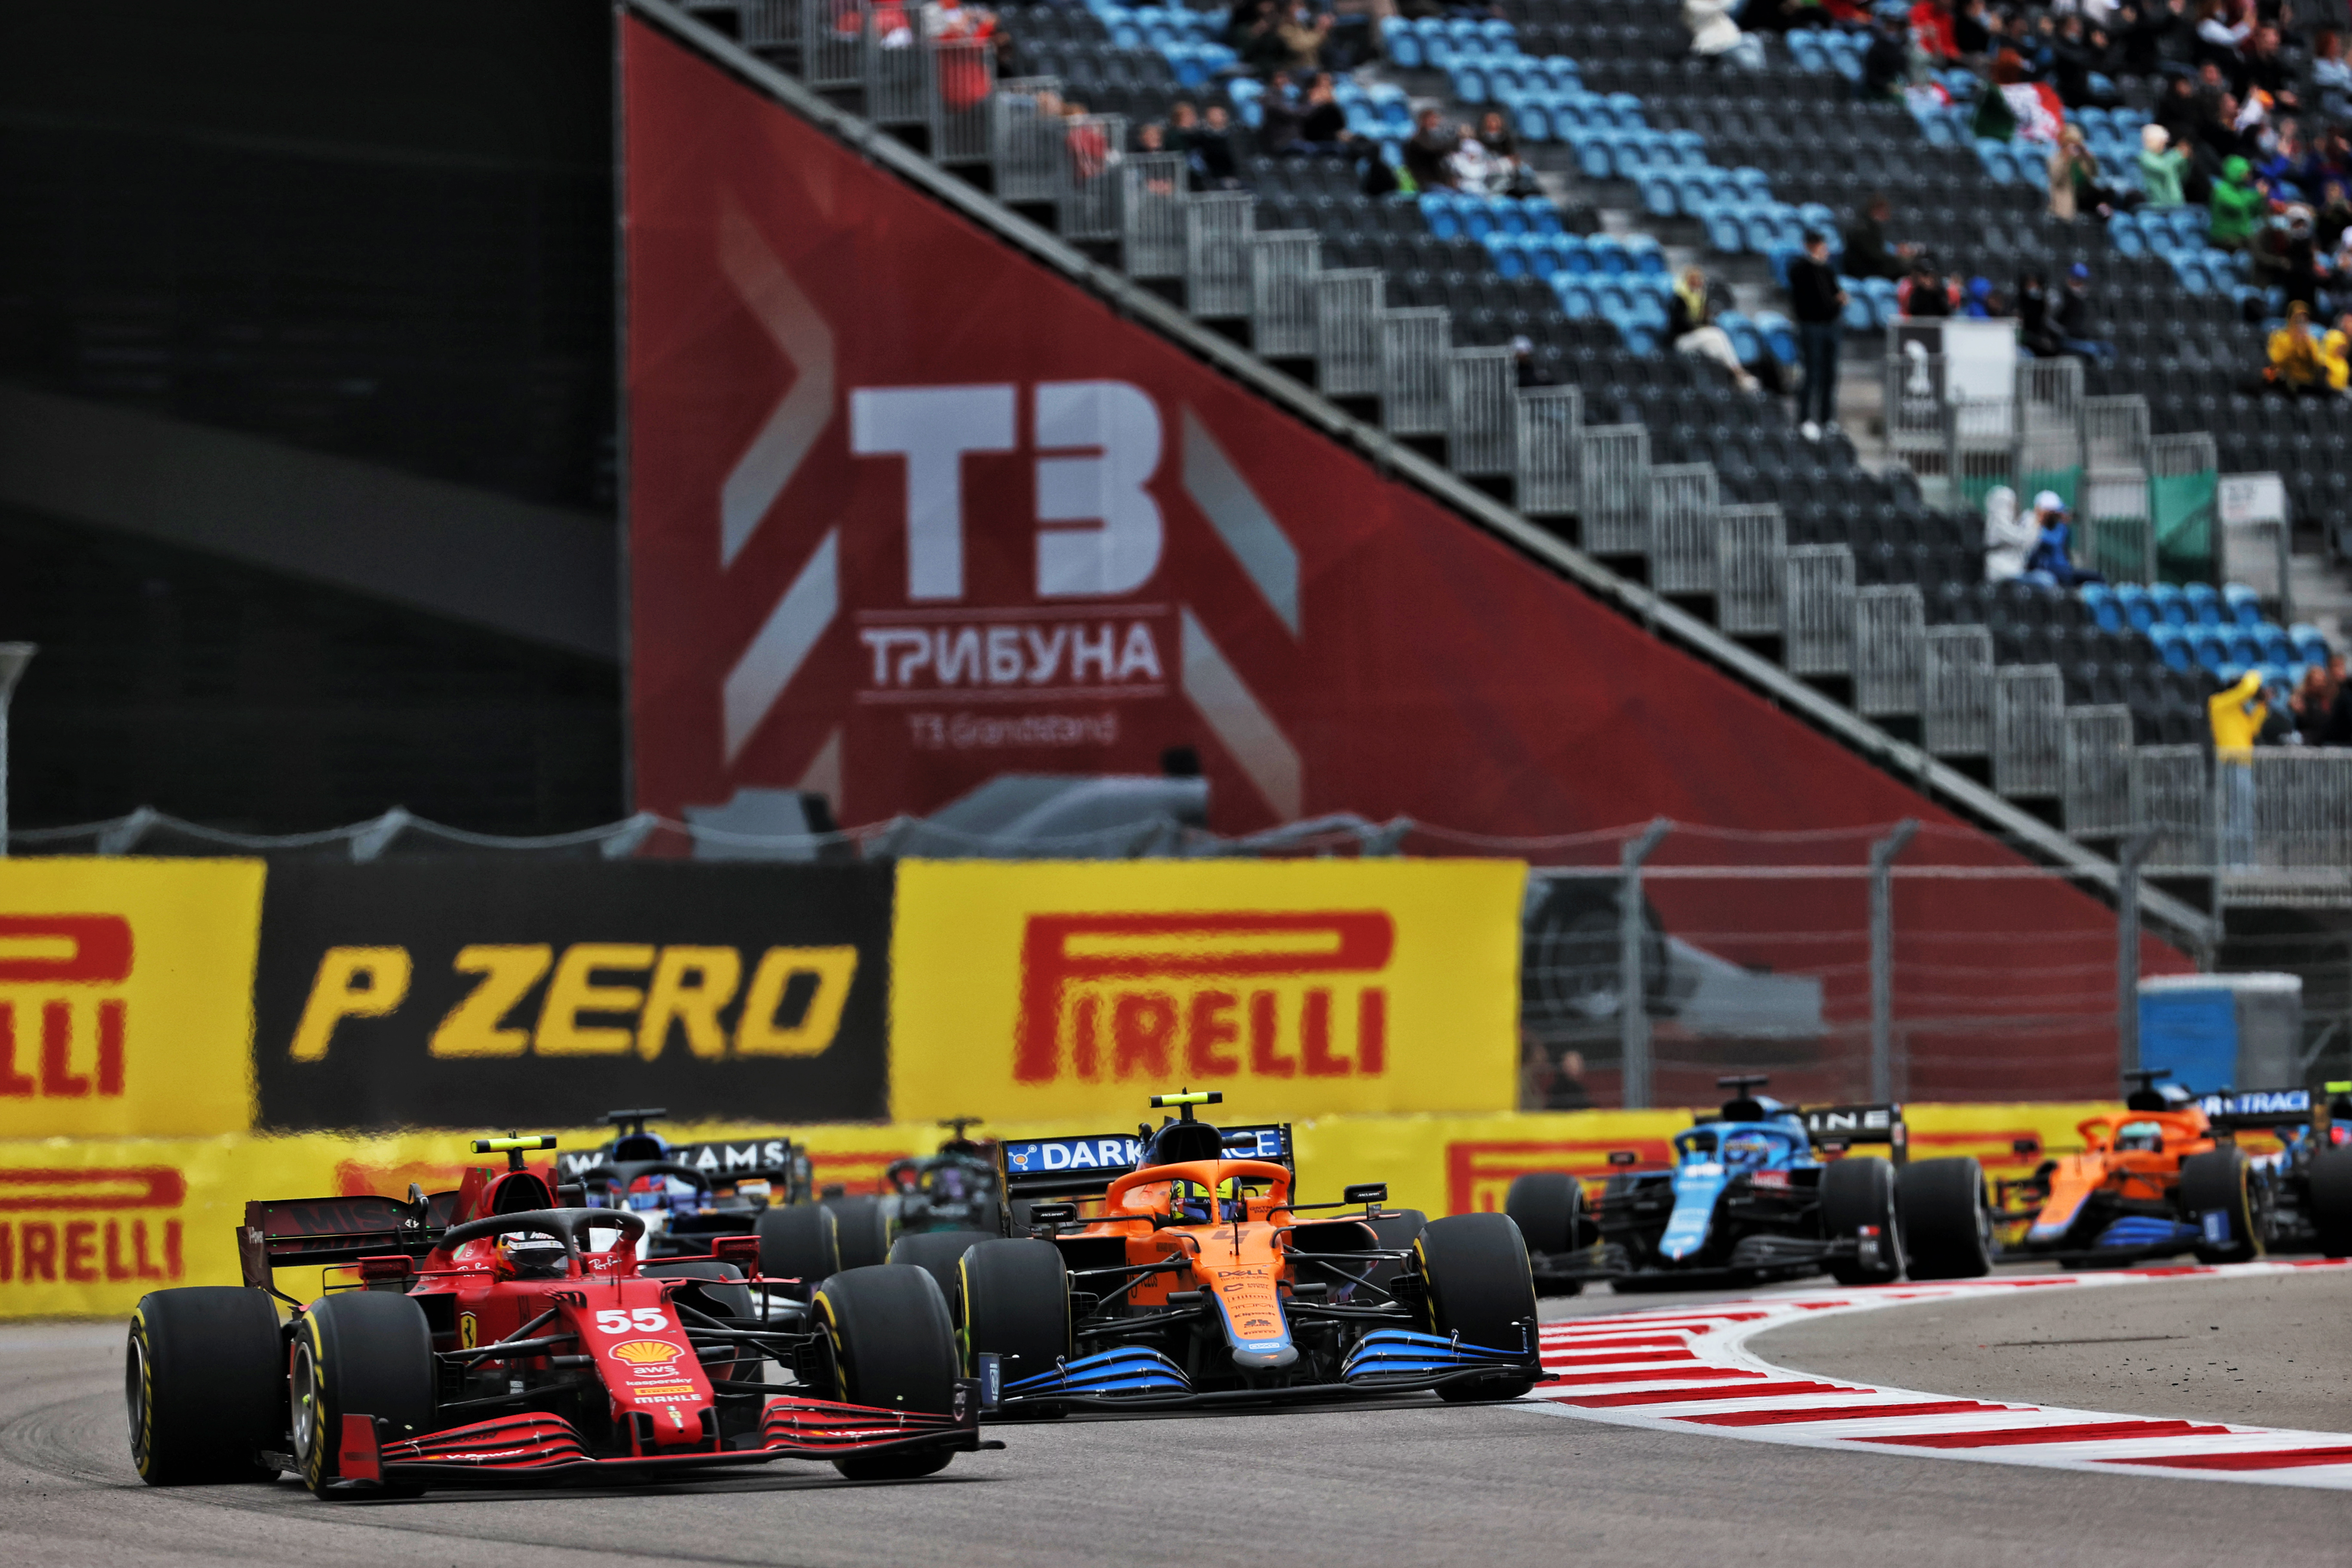 Motor Racing Formula One World Championship Russian Grand Prix Race Day Sochi, Russia